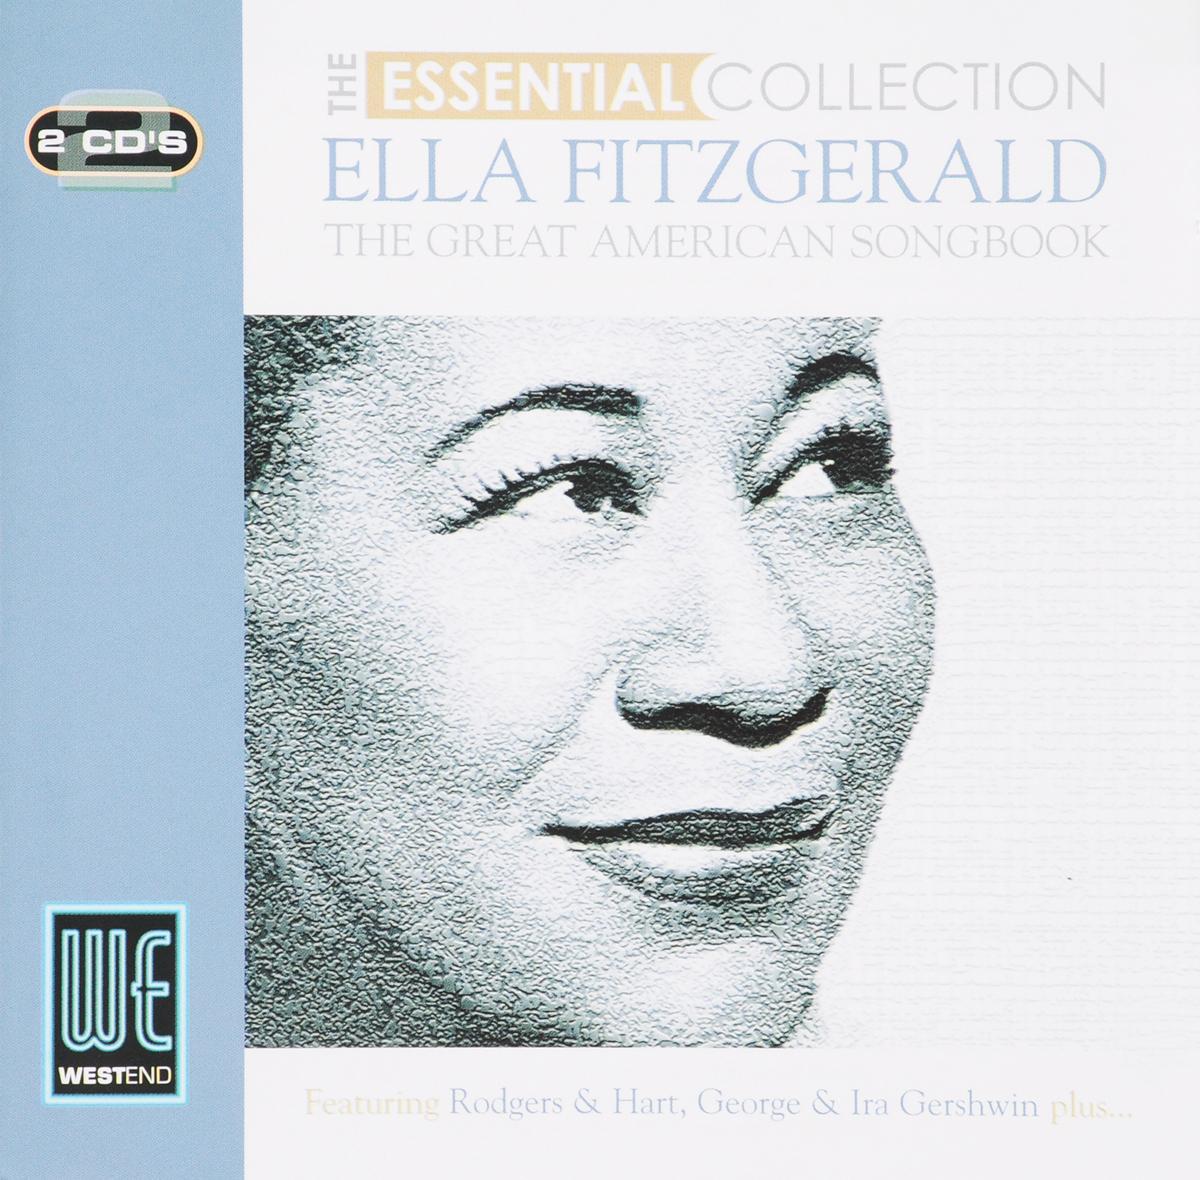 цена Элла Фитцжеральд Ella Fitzgerald. Great American Songbook the Essential Collection (2 CD) в интернет-магазинах